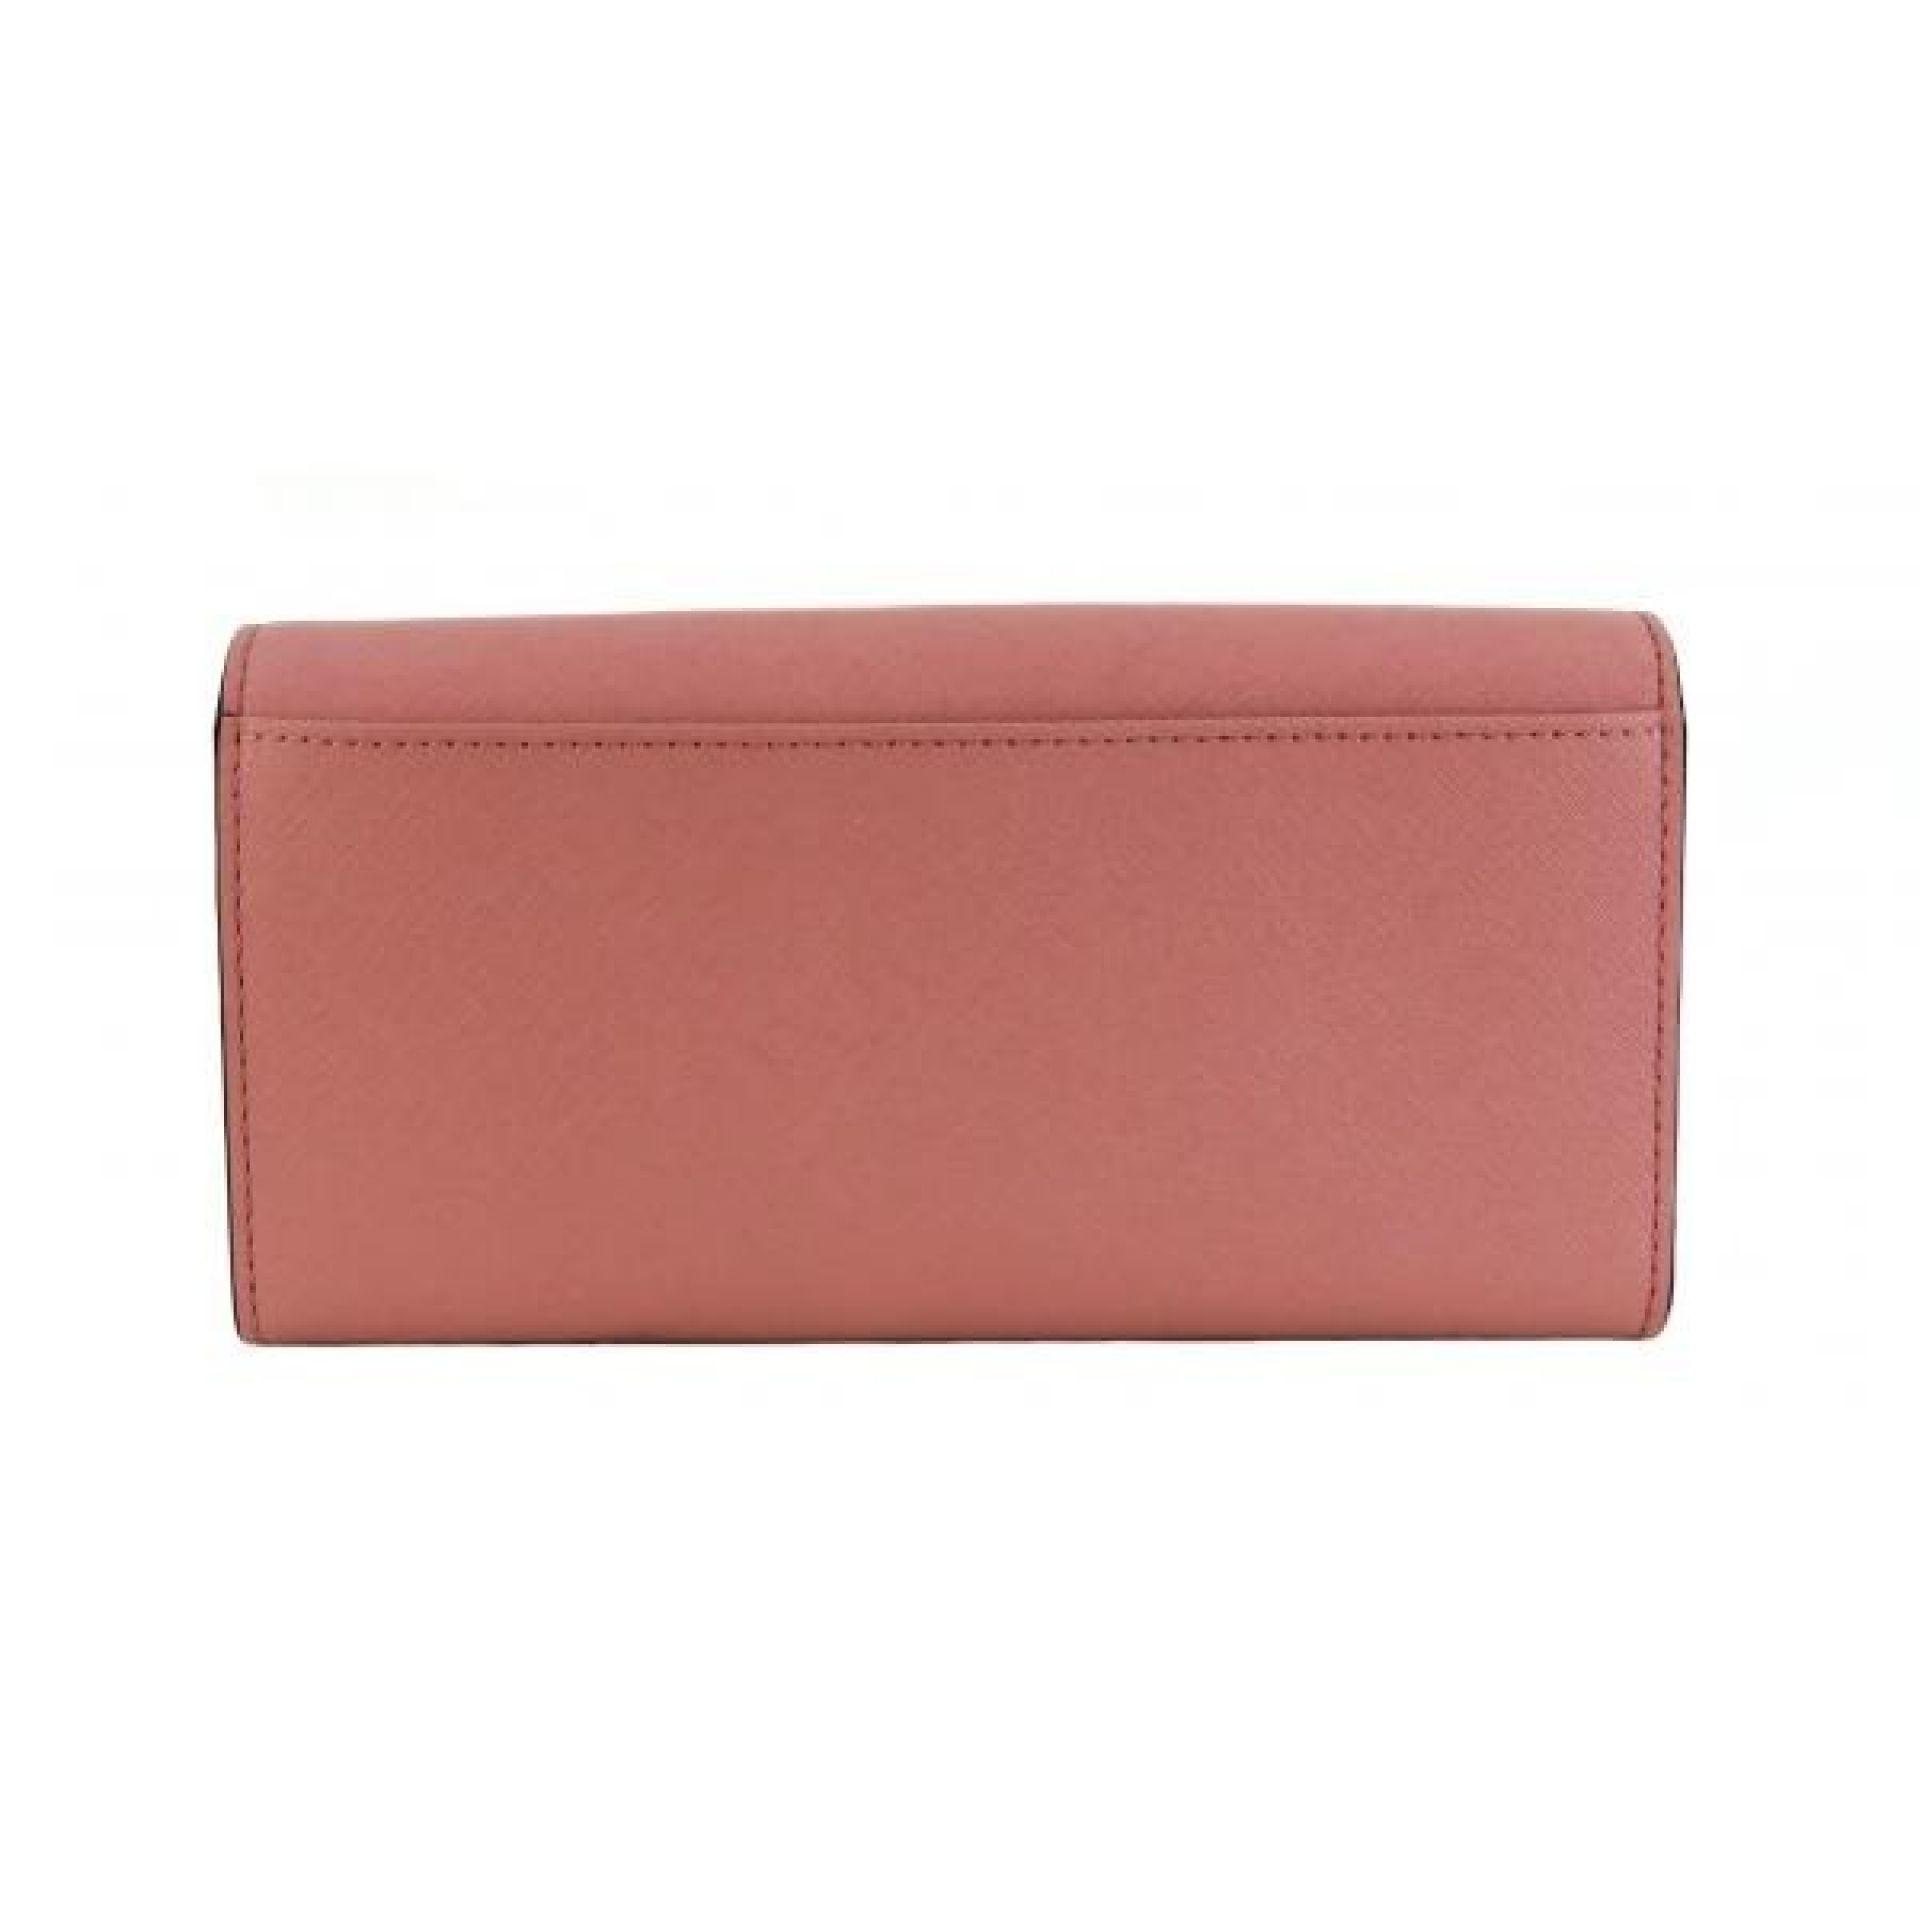 Kate Spade Pink Saffiano Leather Laurel Way Winni Clutch Wallet